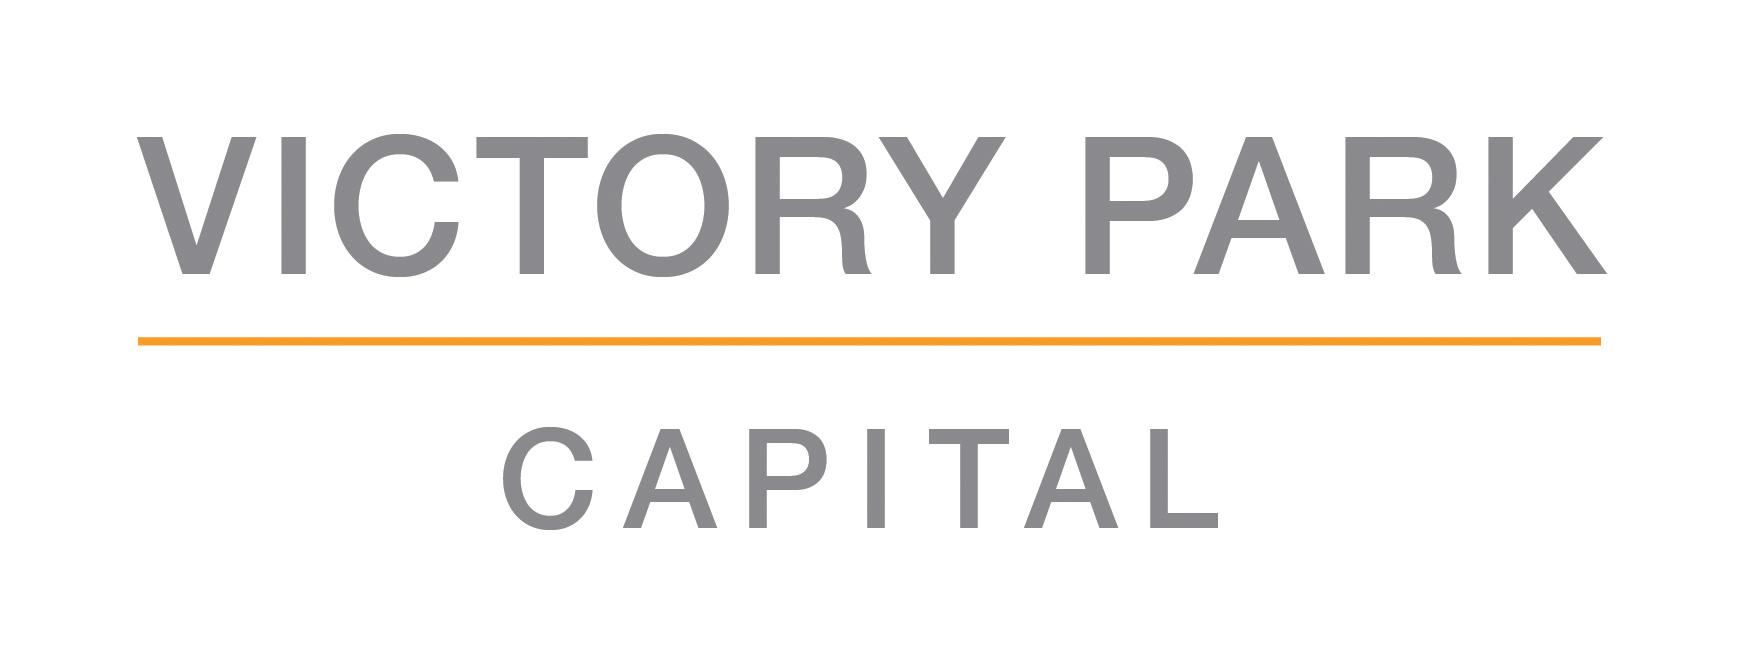 Victory-Park-Capital-logo